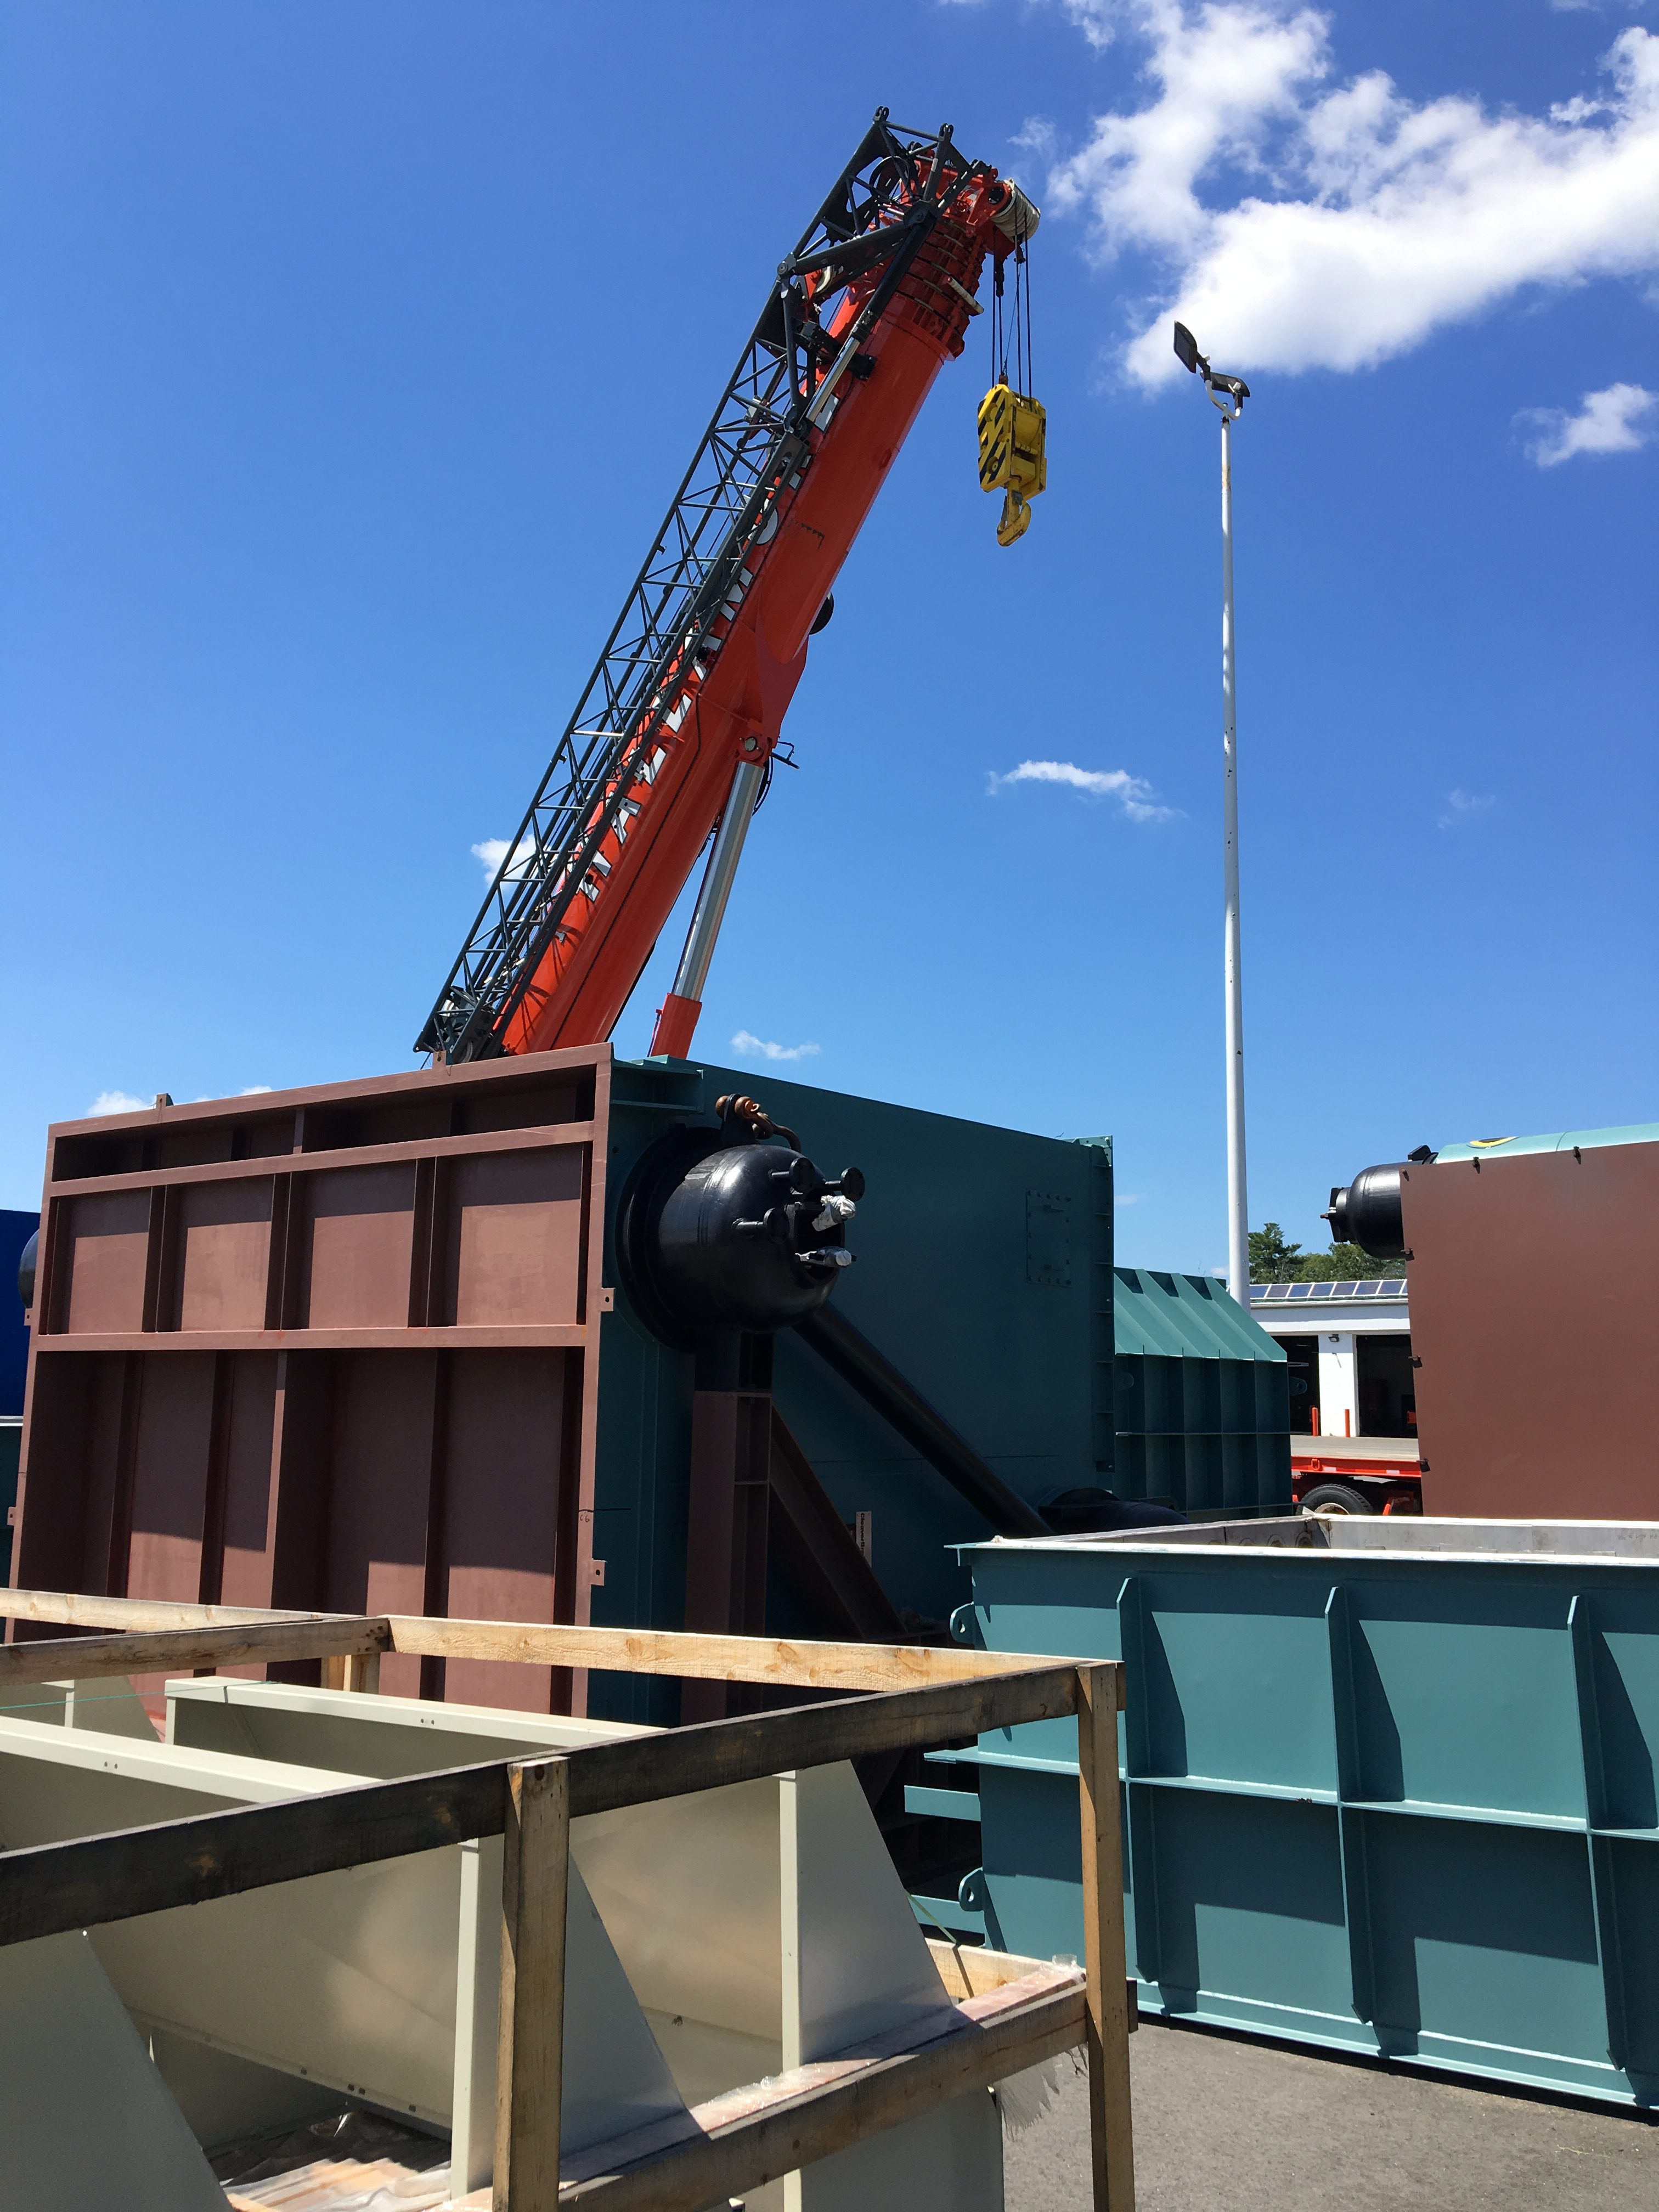 Cleaver Brooks delivers 80 000 PPH HRSG boiler to Boston